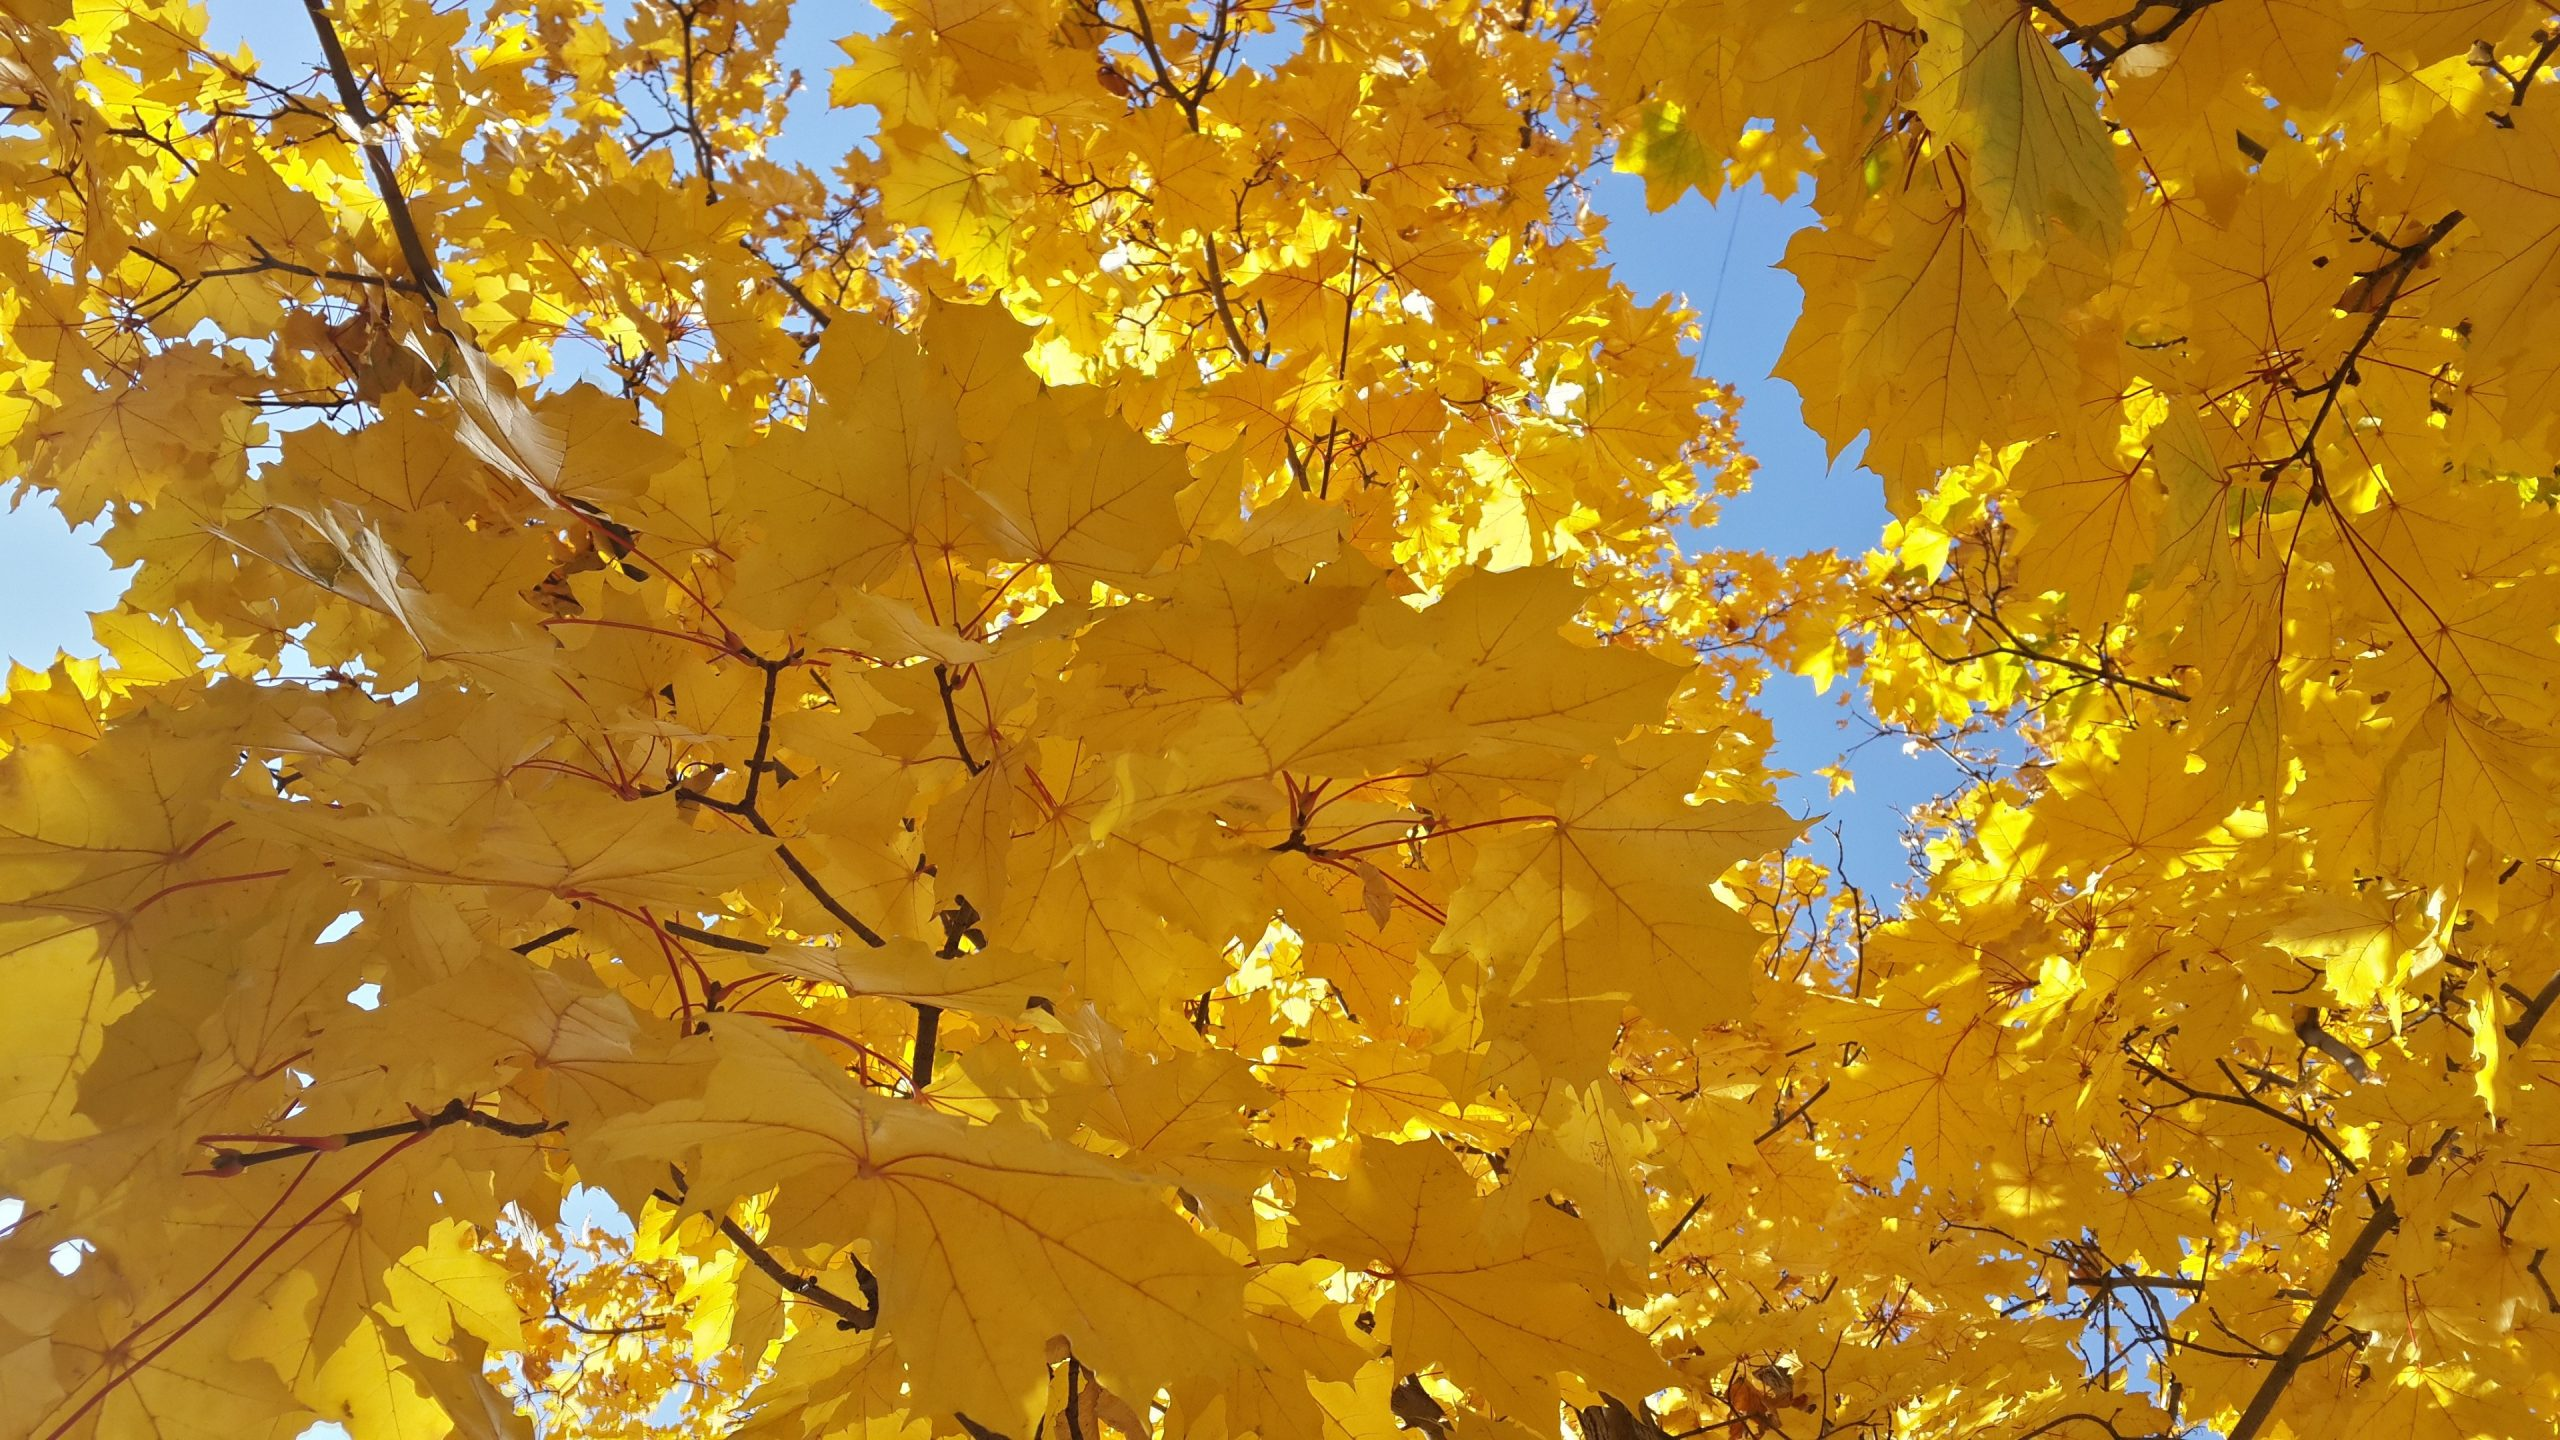 Autumn Fall Wallpaper 1600x900 Yellow Leaves Wallpaper 4k Background Hd Wallpaper